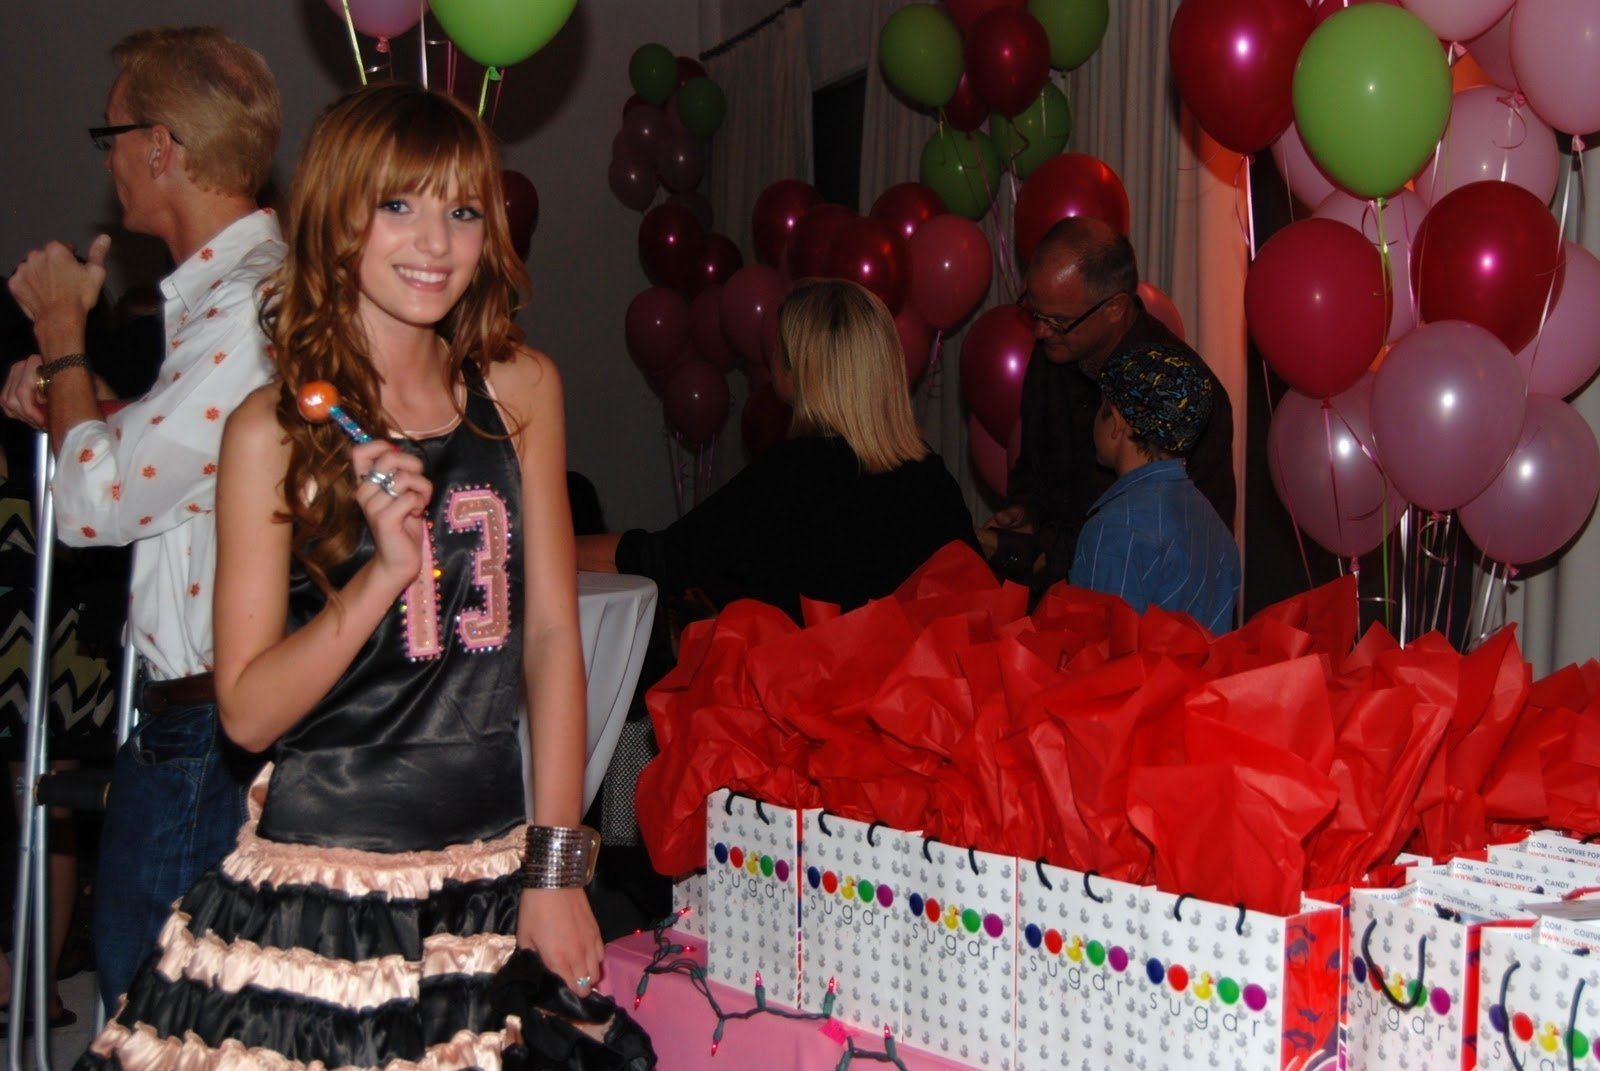 10 Pretty Ideas For A 13Th Birthday Party 13th birthday party ideas for girls margusriga baby party fabulous 2 2021